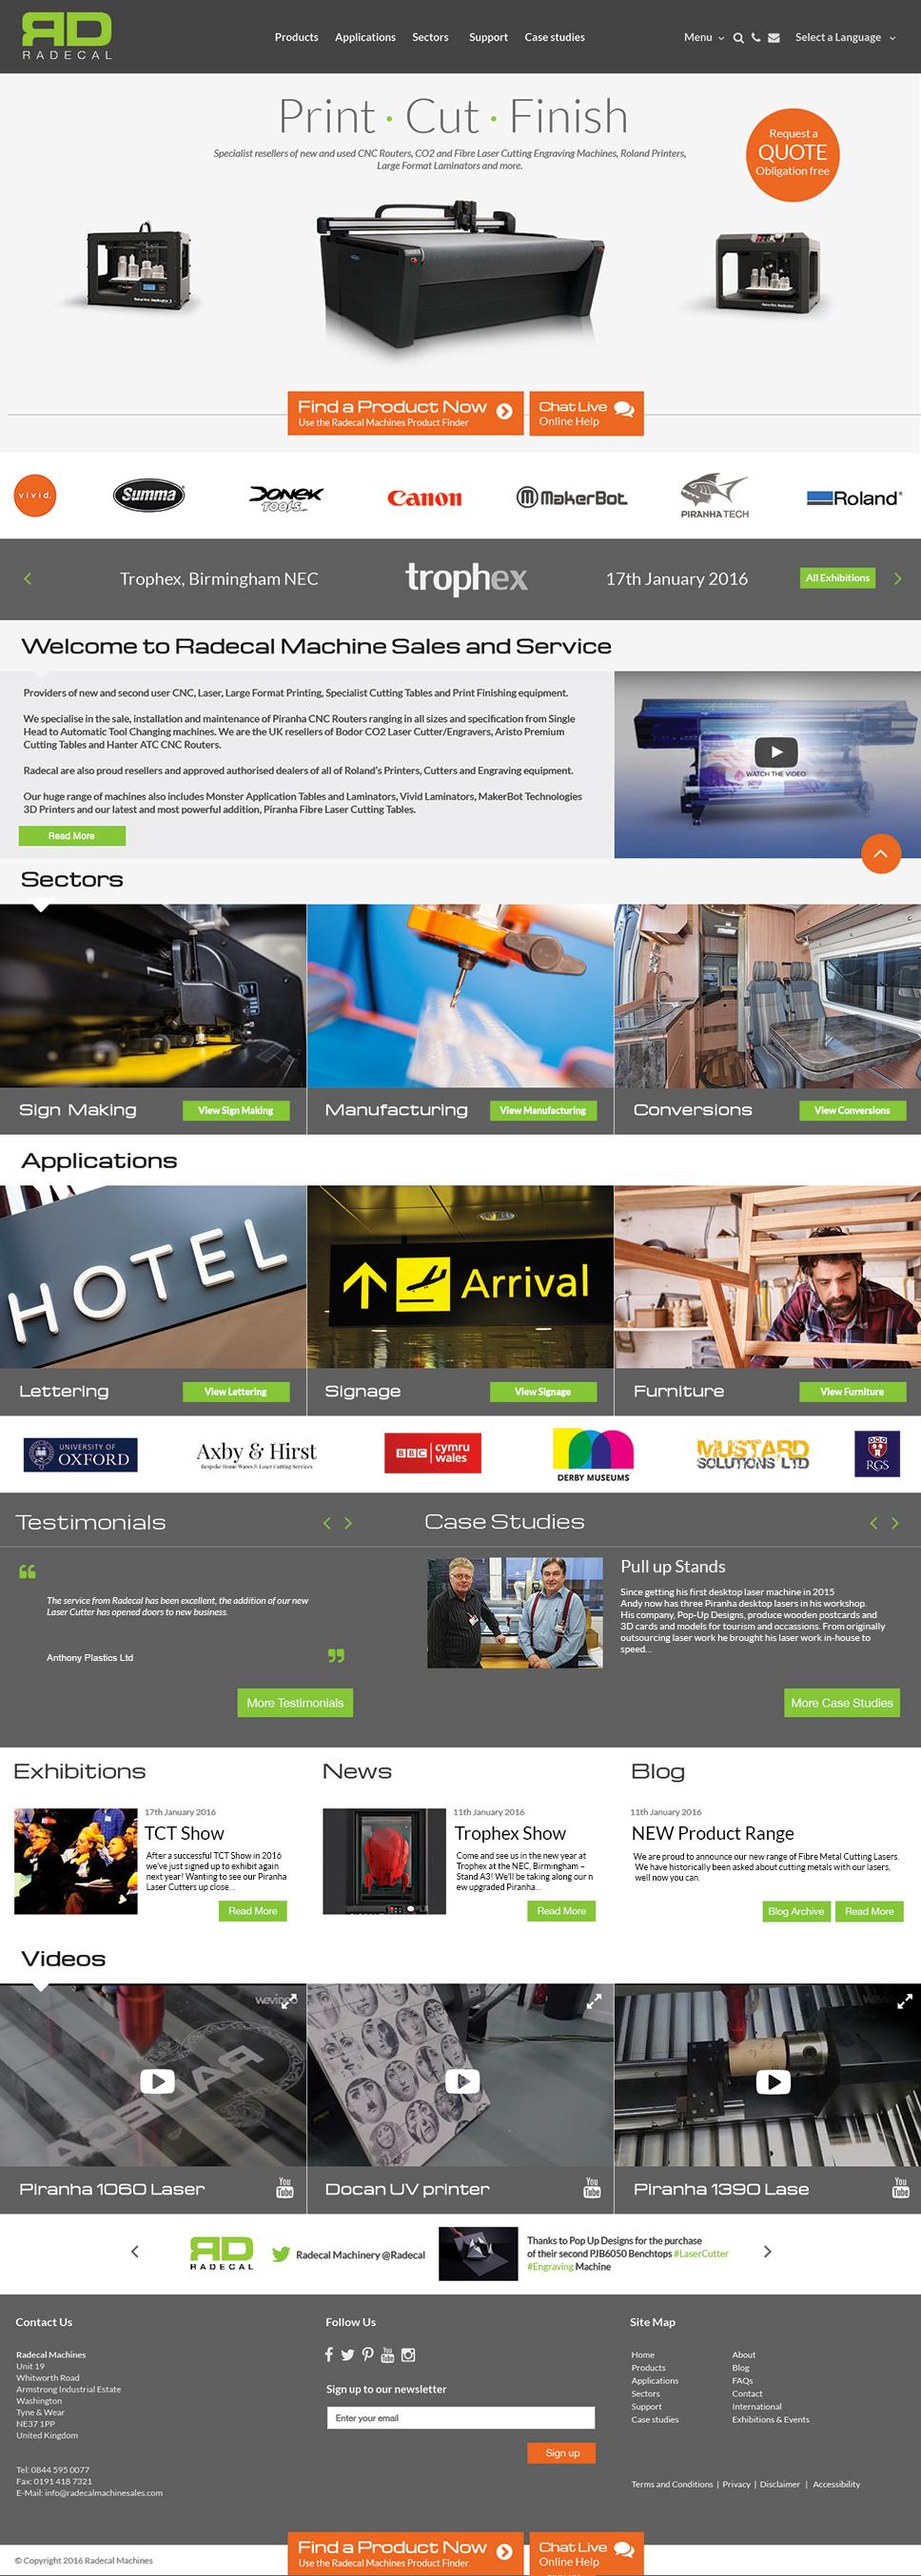 promotional website